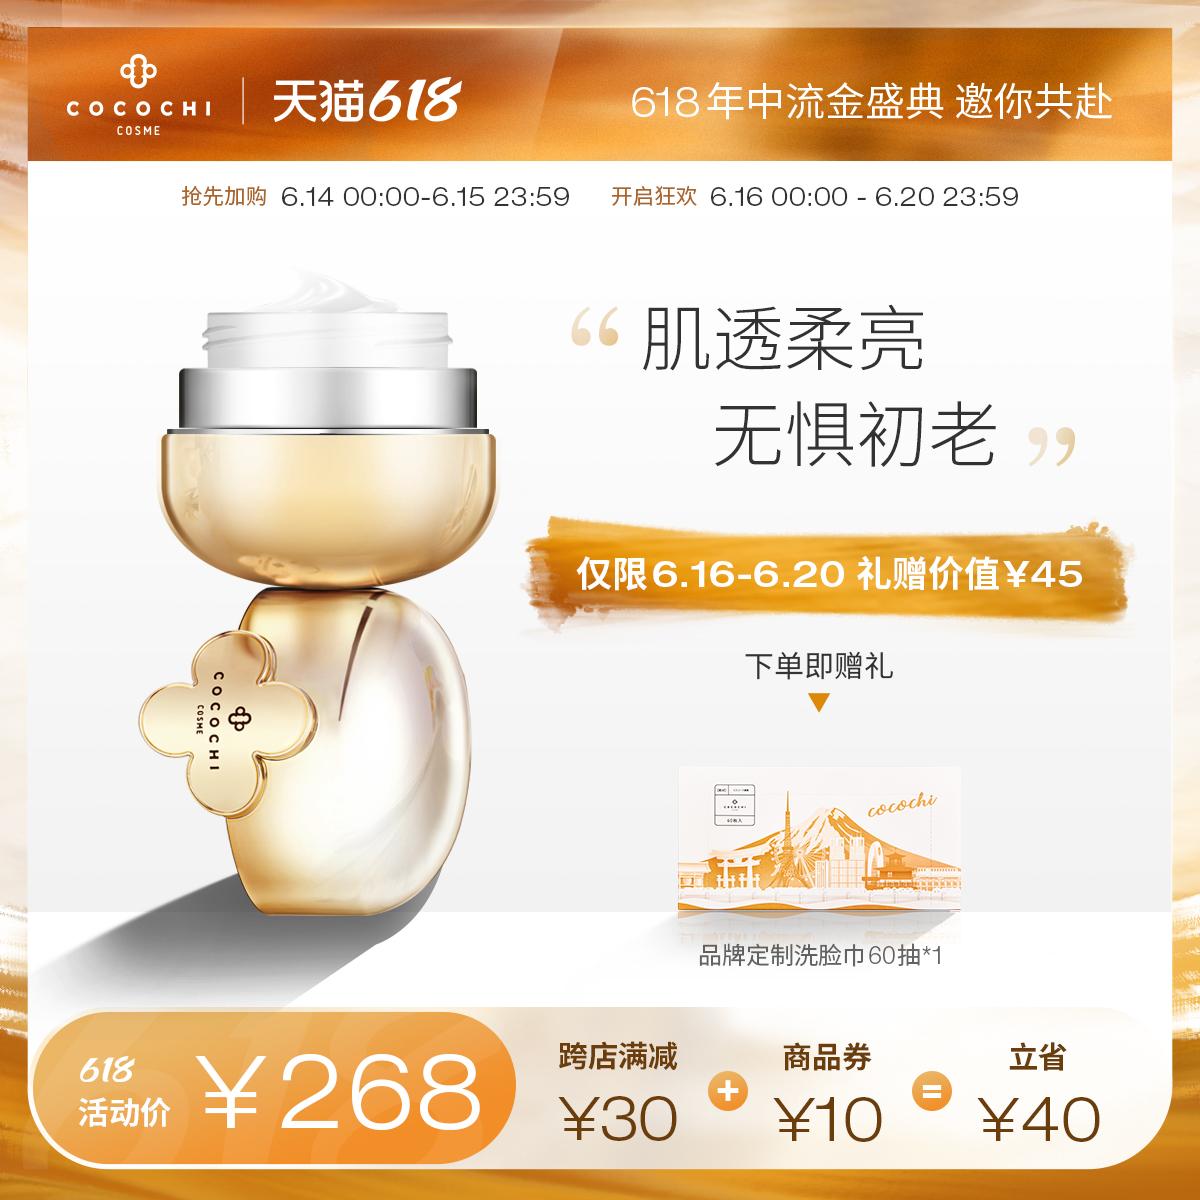 cocochi日本AG抗糖小金罐涂抹面膜 祛黄保湿补水多维修护面膜